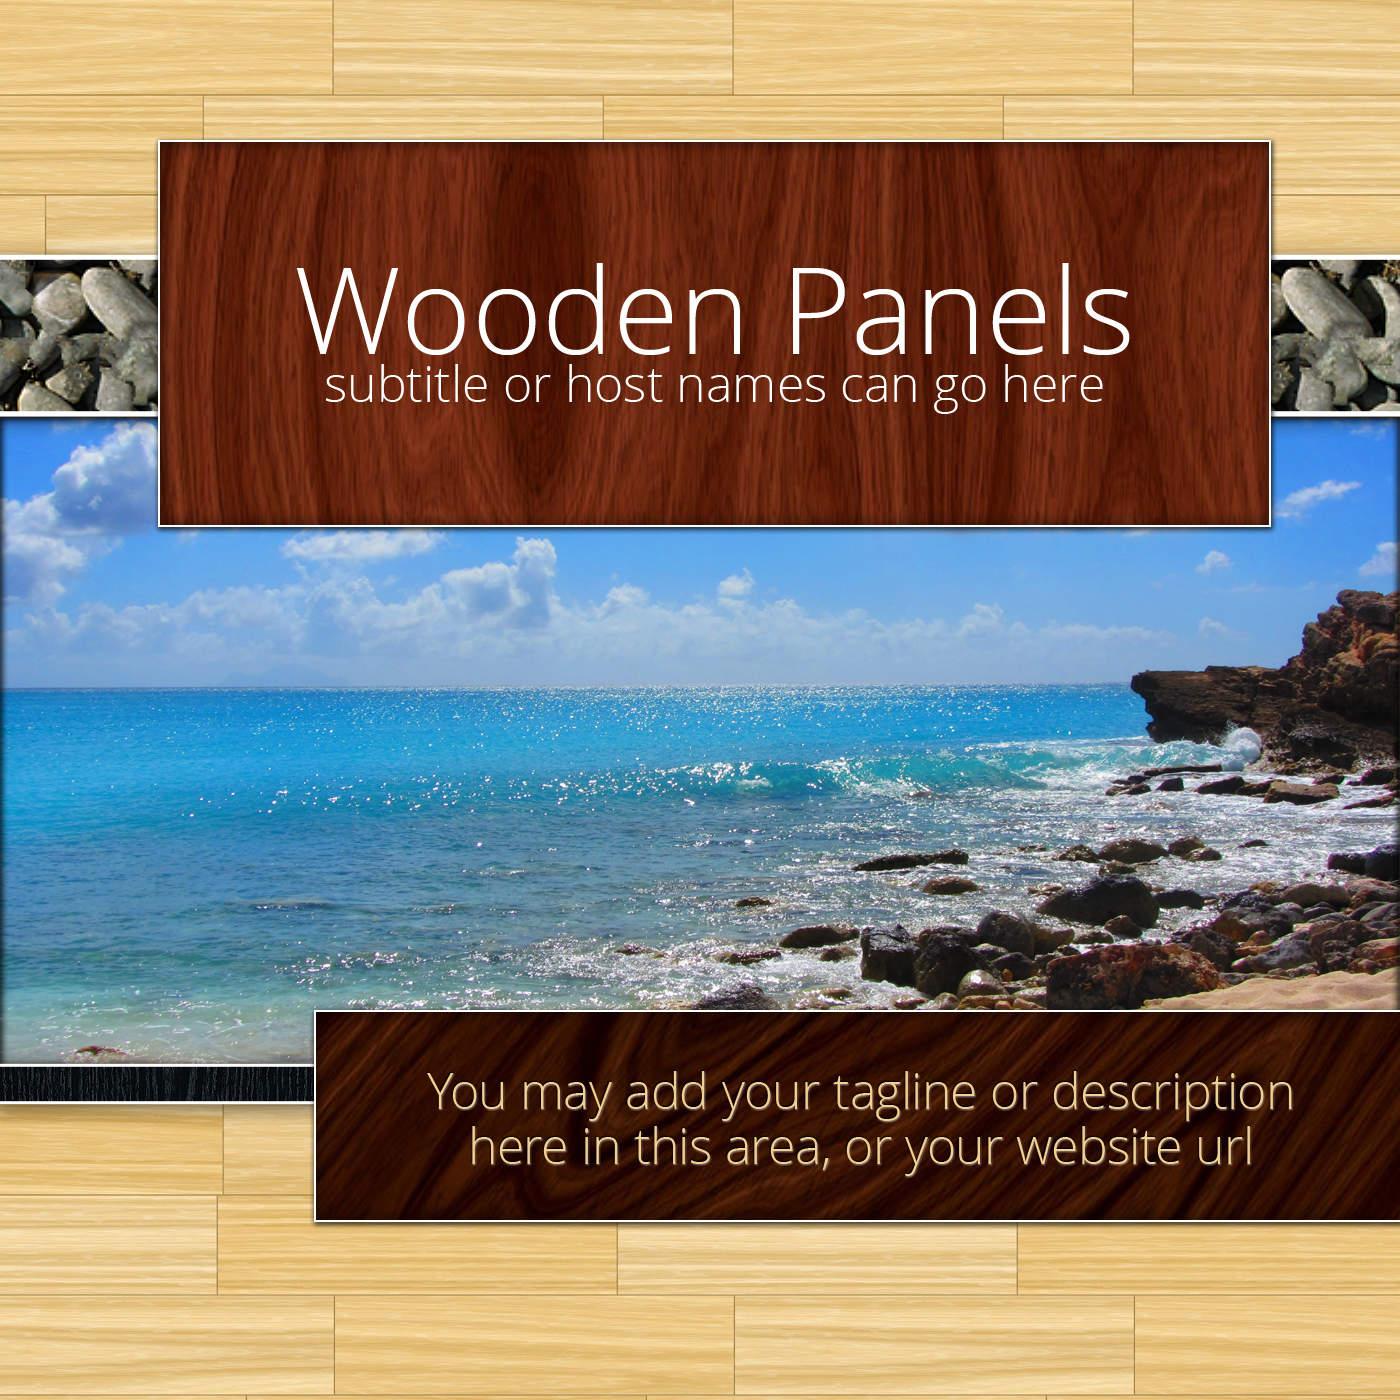 WoodenPanelsPodcast